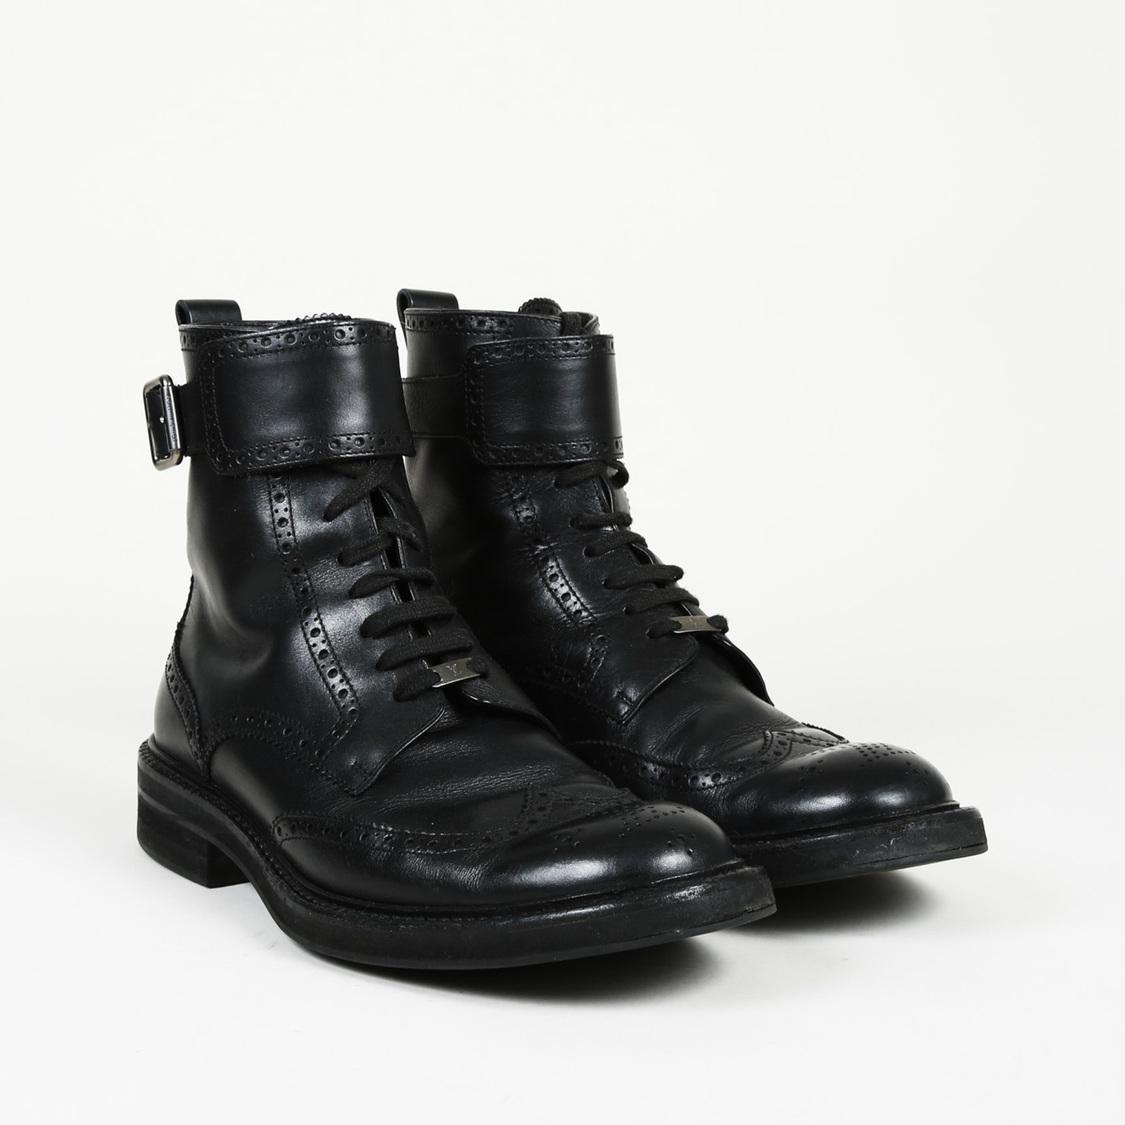 38f1da455294 Louis Vuitton Leather Brogue Ankle Boots Men s in Black for Men - Lyst